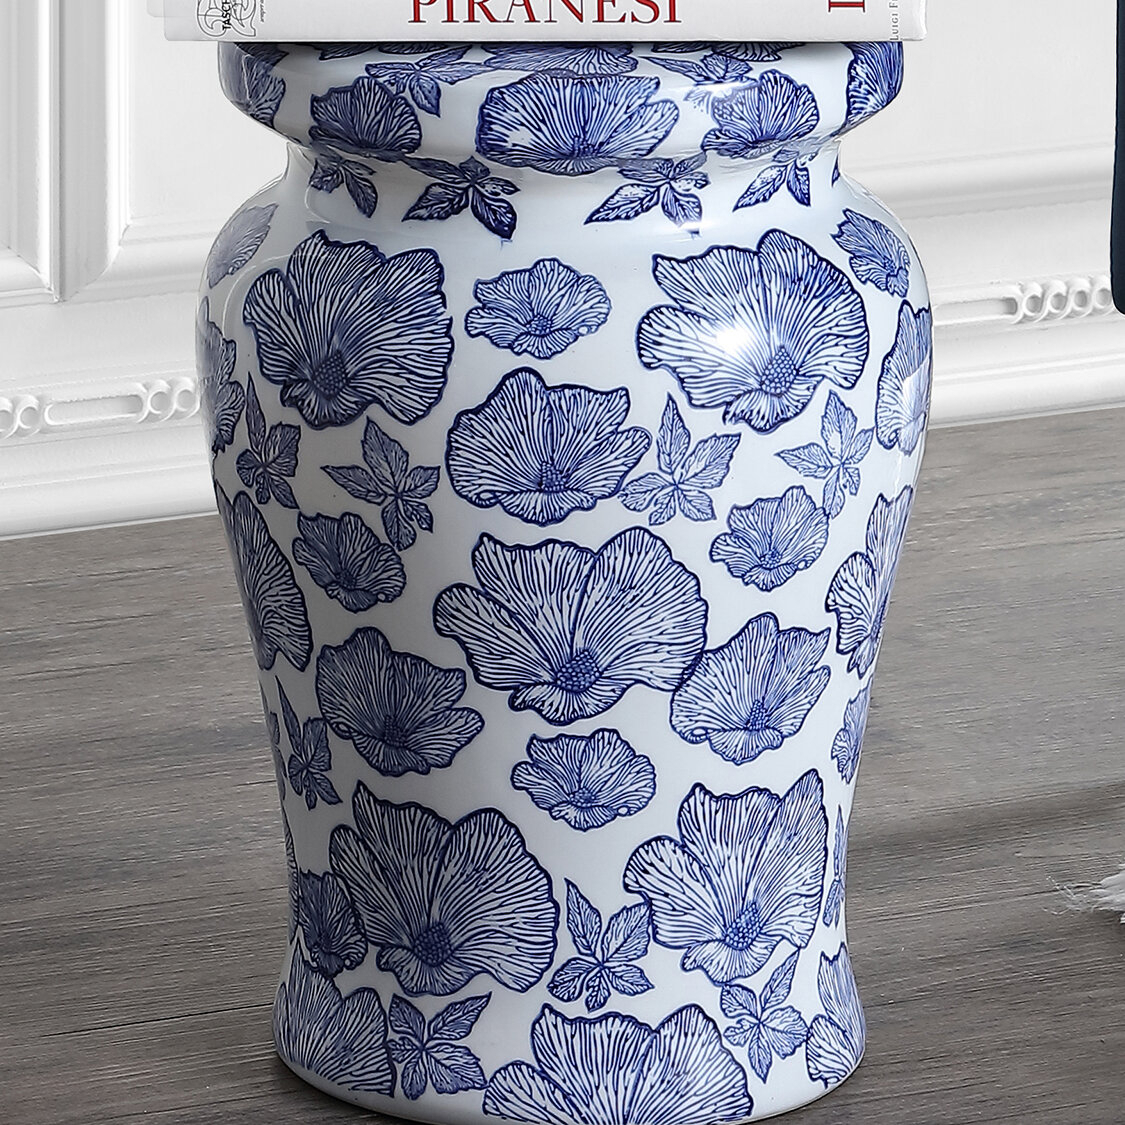 Featured Image of Wilde Poppies Ceramic Garden Stools